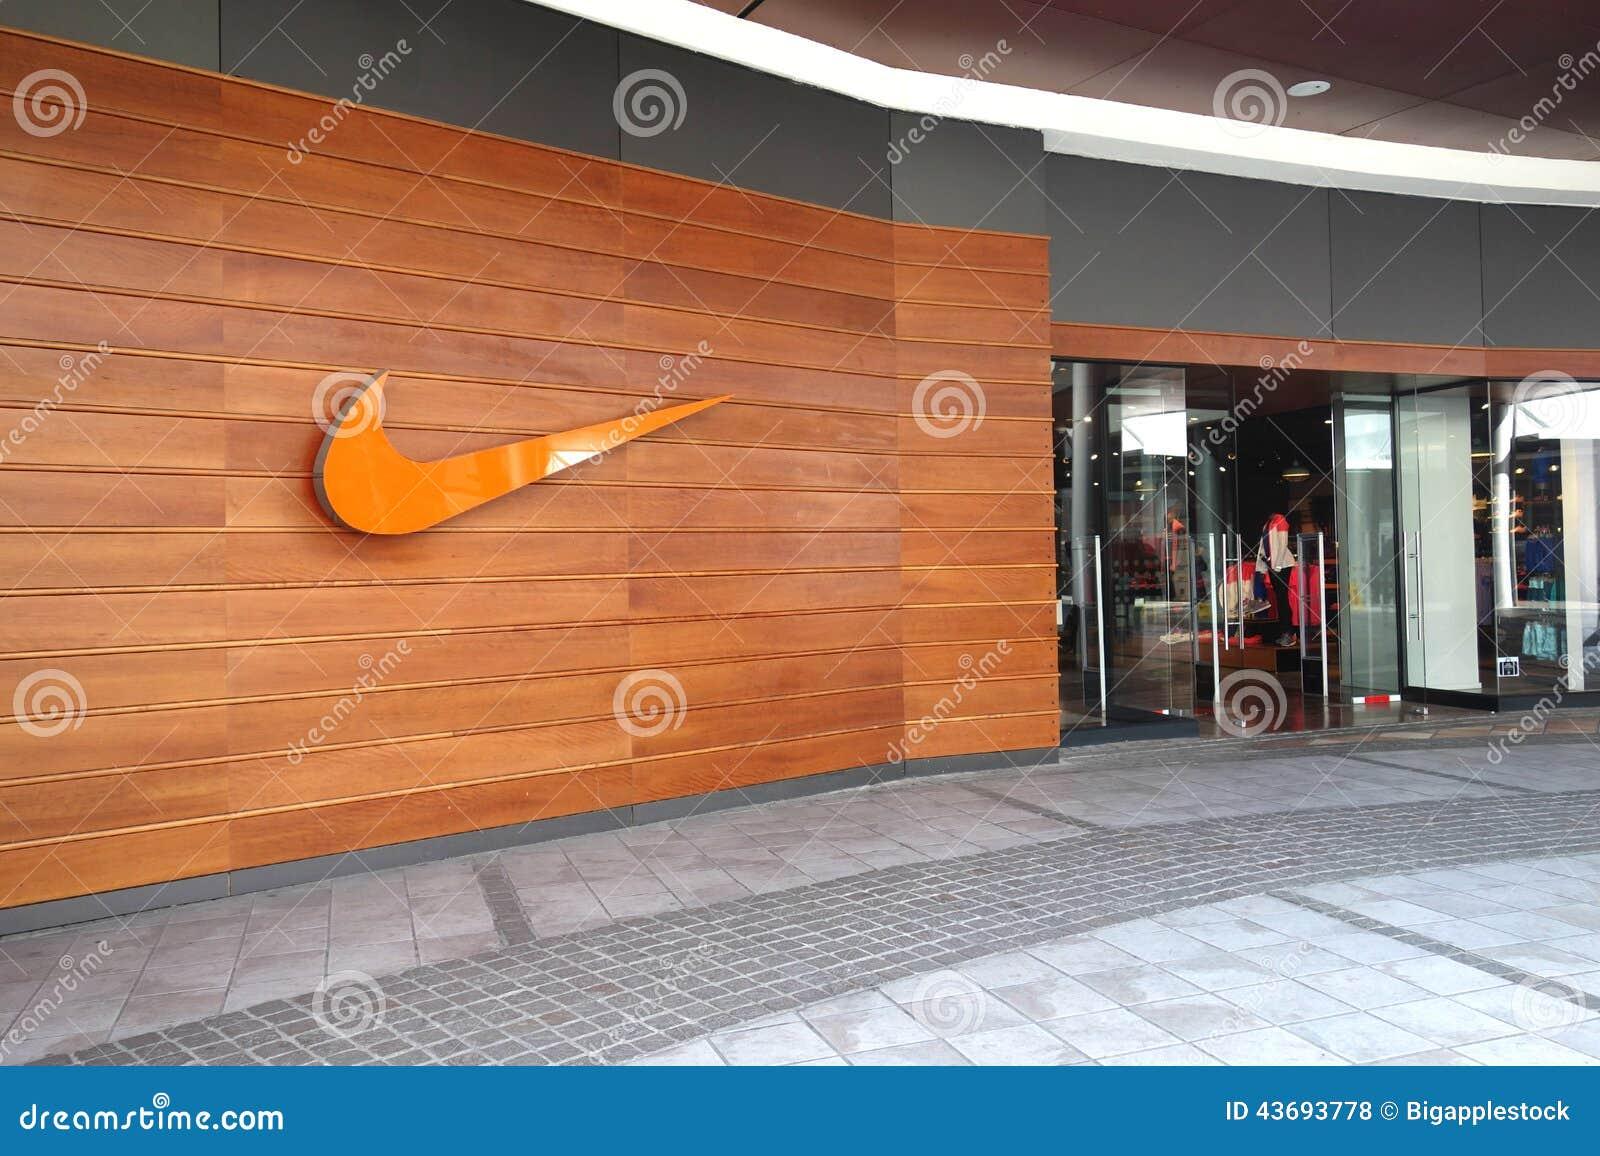 césped desmayarse entonces  Nike Store editorial stock photo. Image of nike, santiago - 43693778